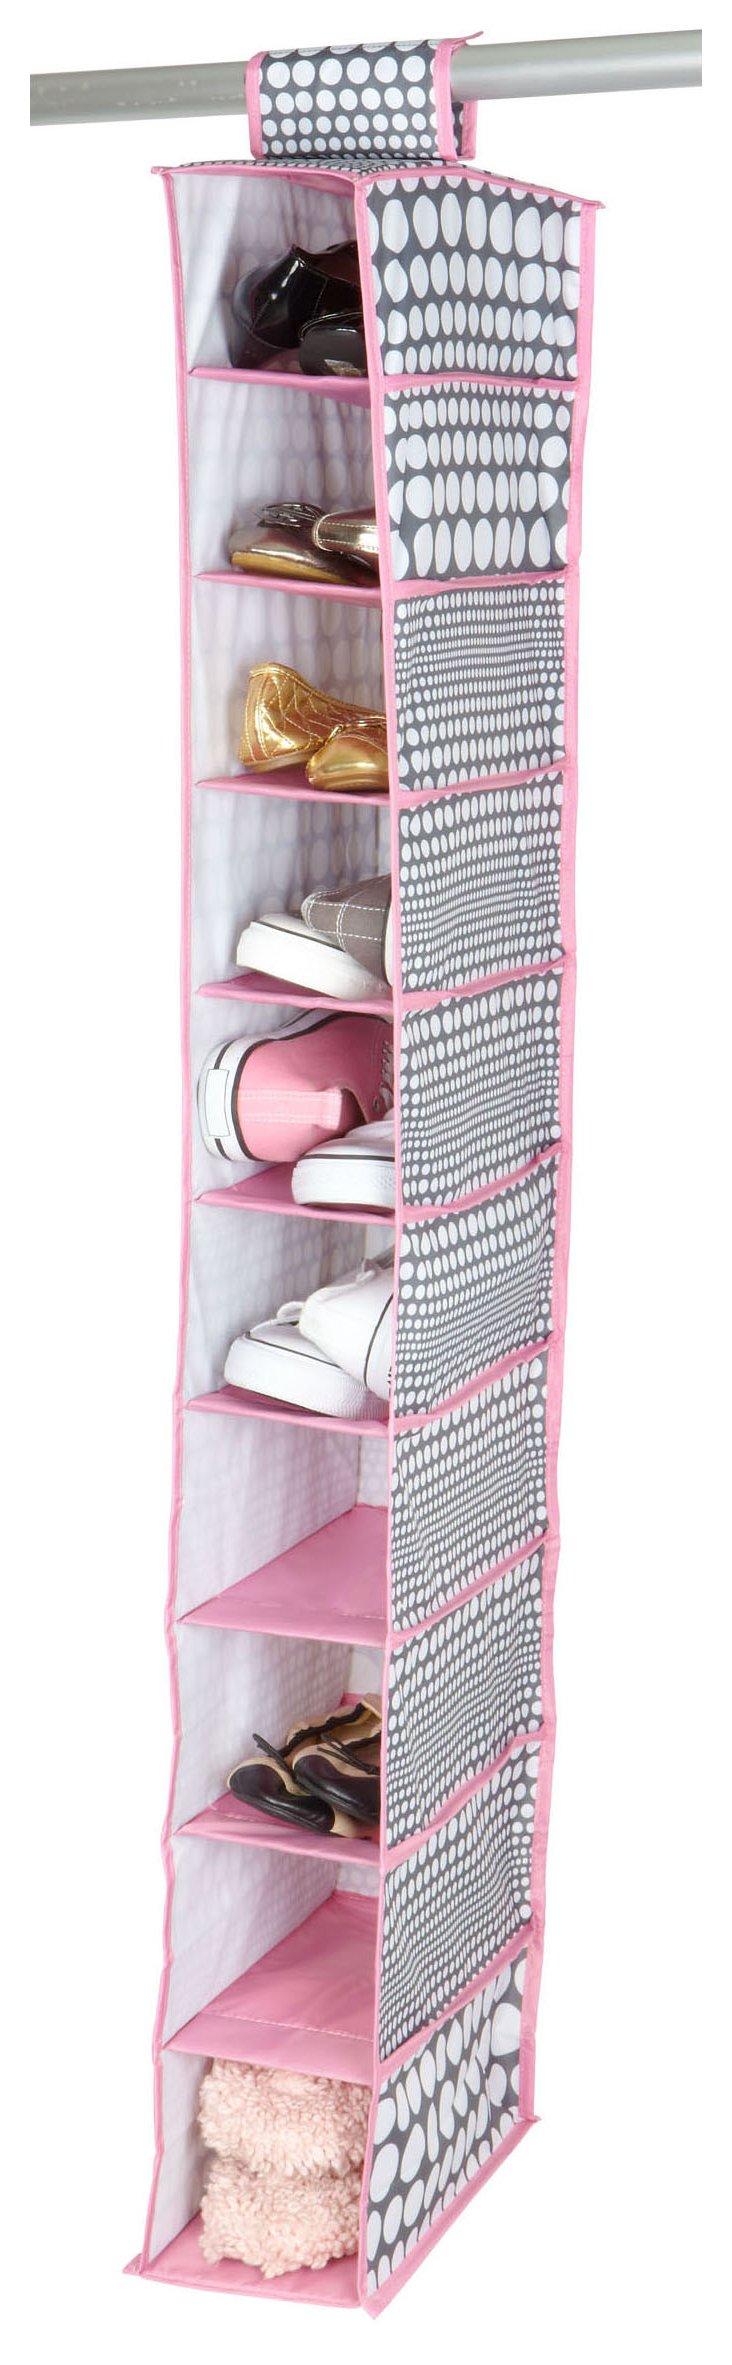 10-Shelf Hanging Organizer, Dots